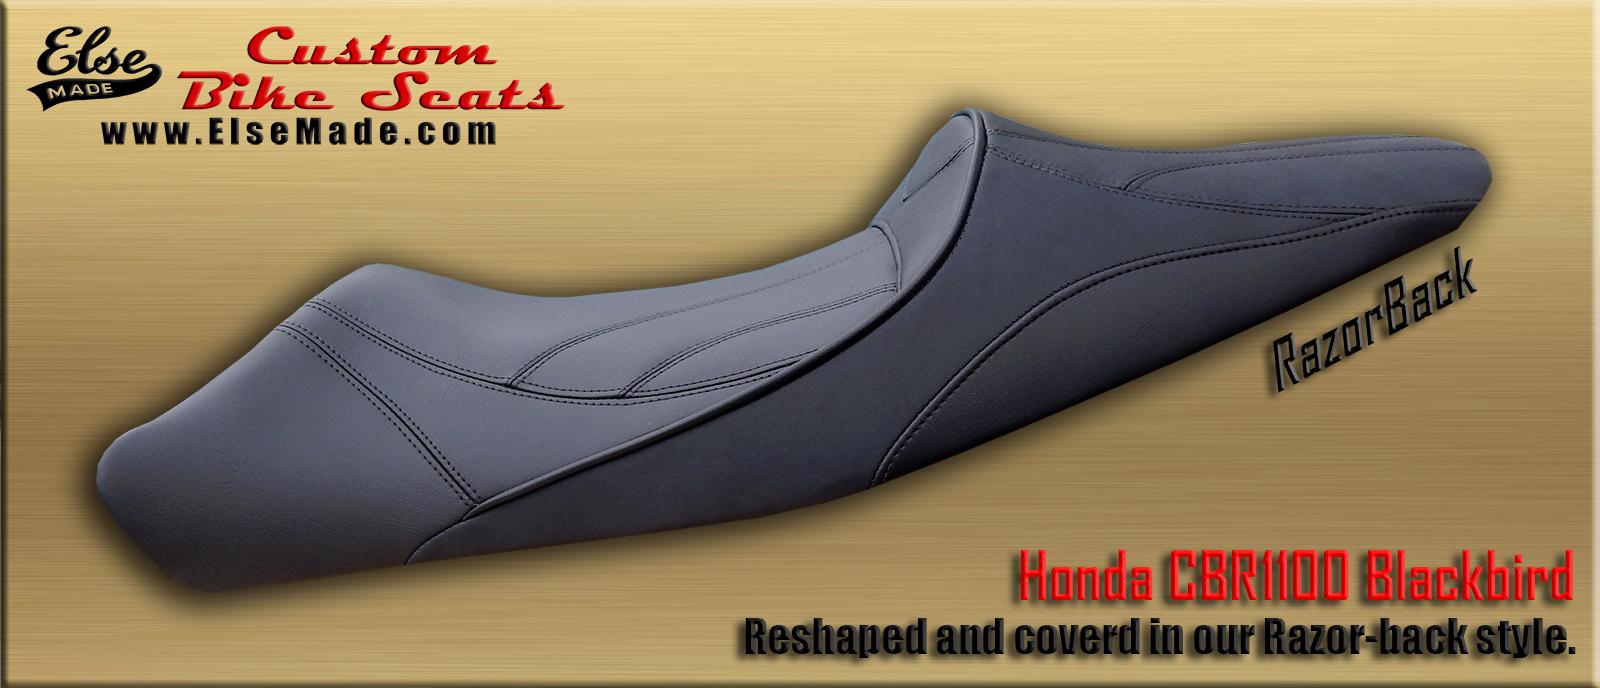 blackbird razorback 5 full size.jpg